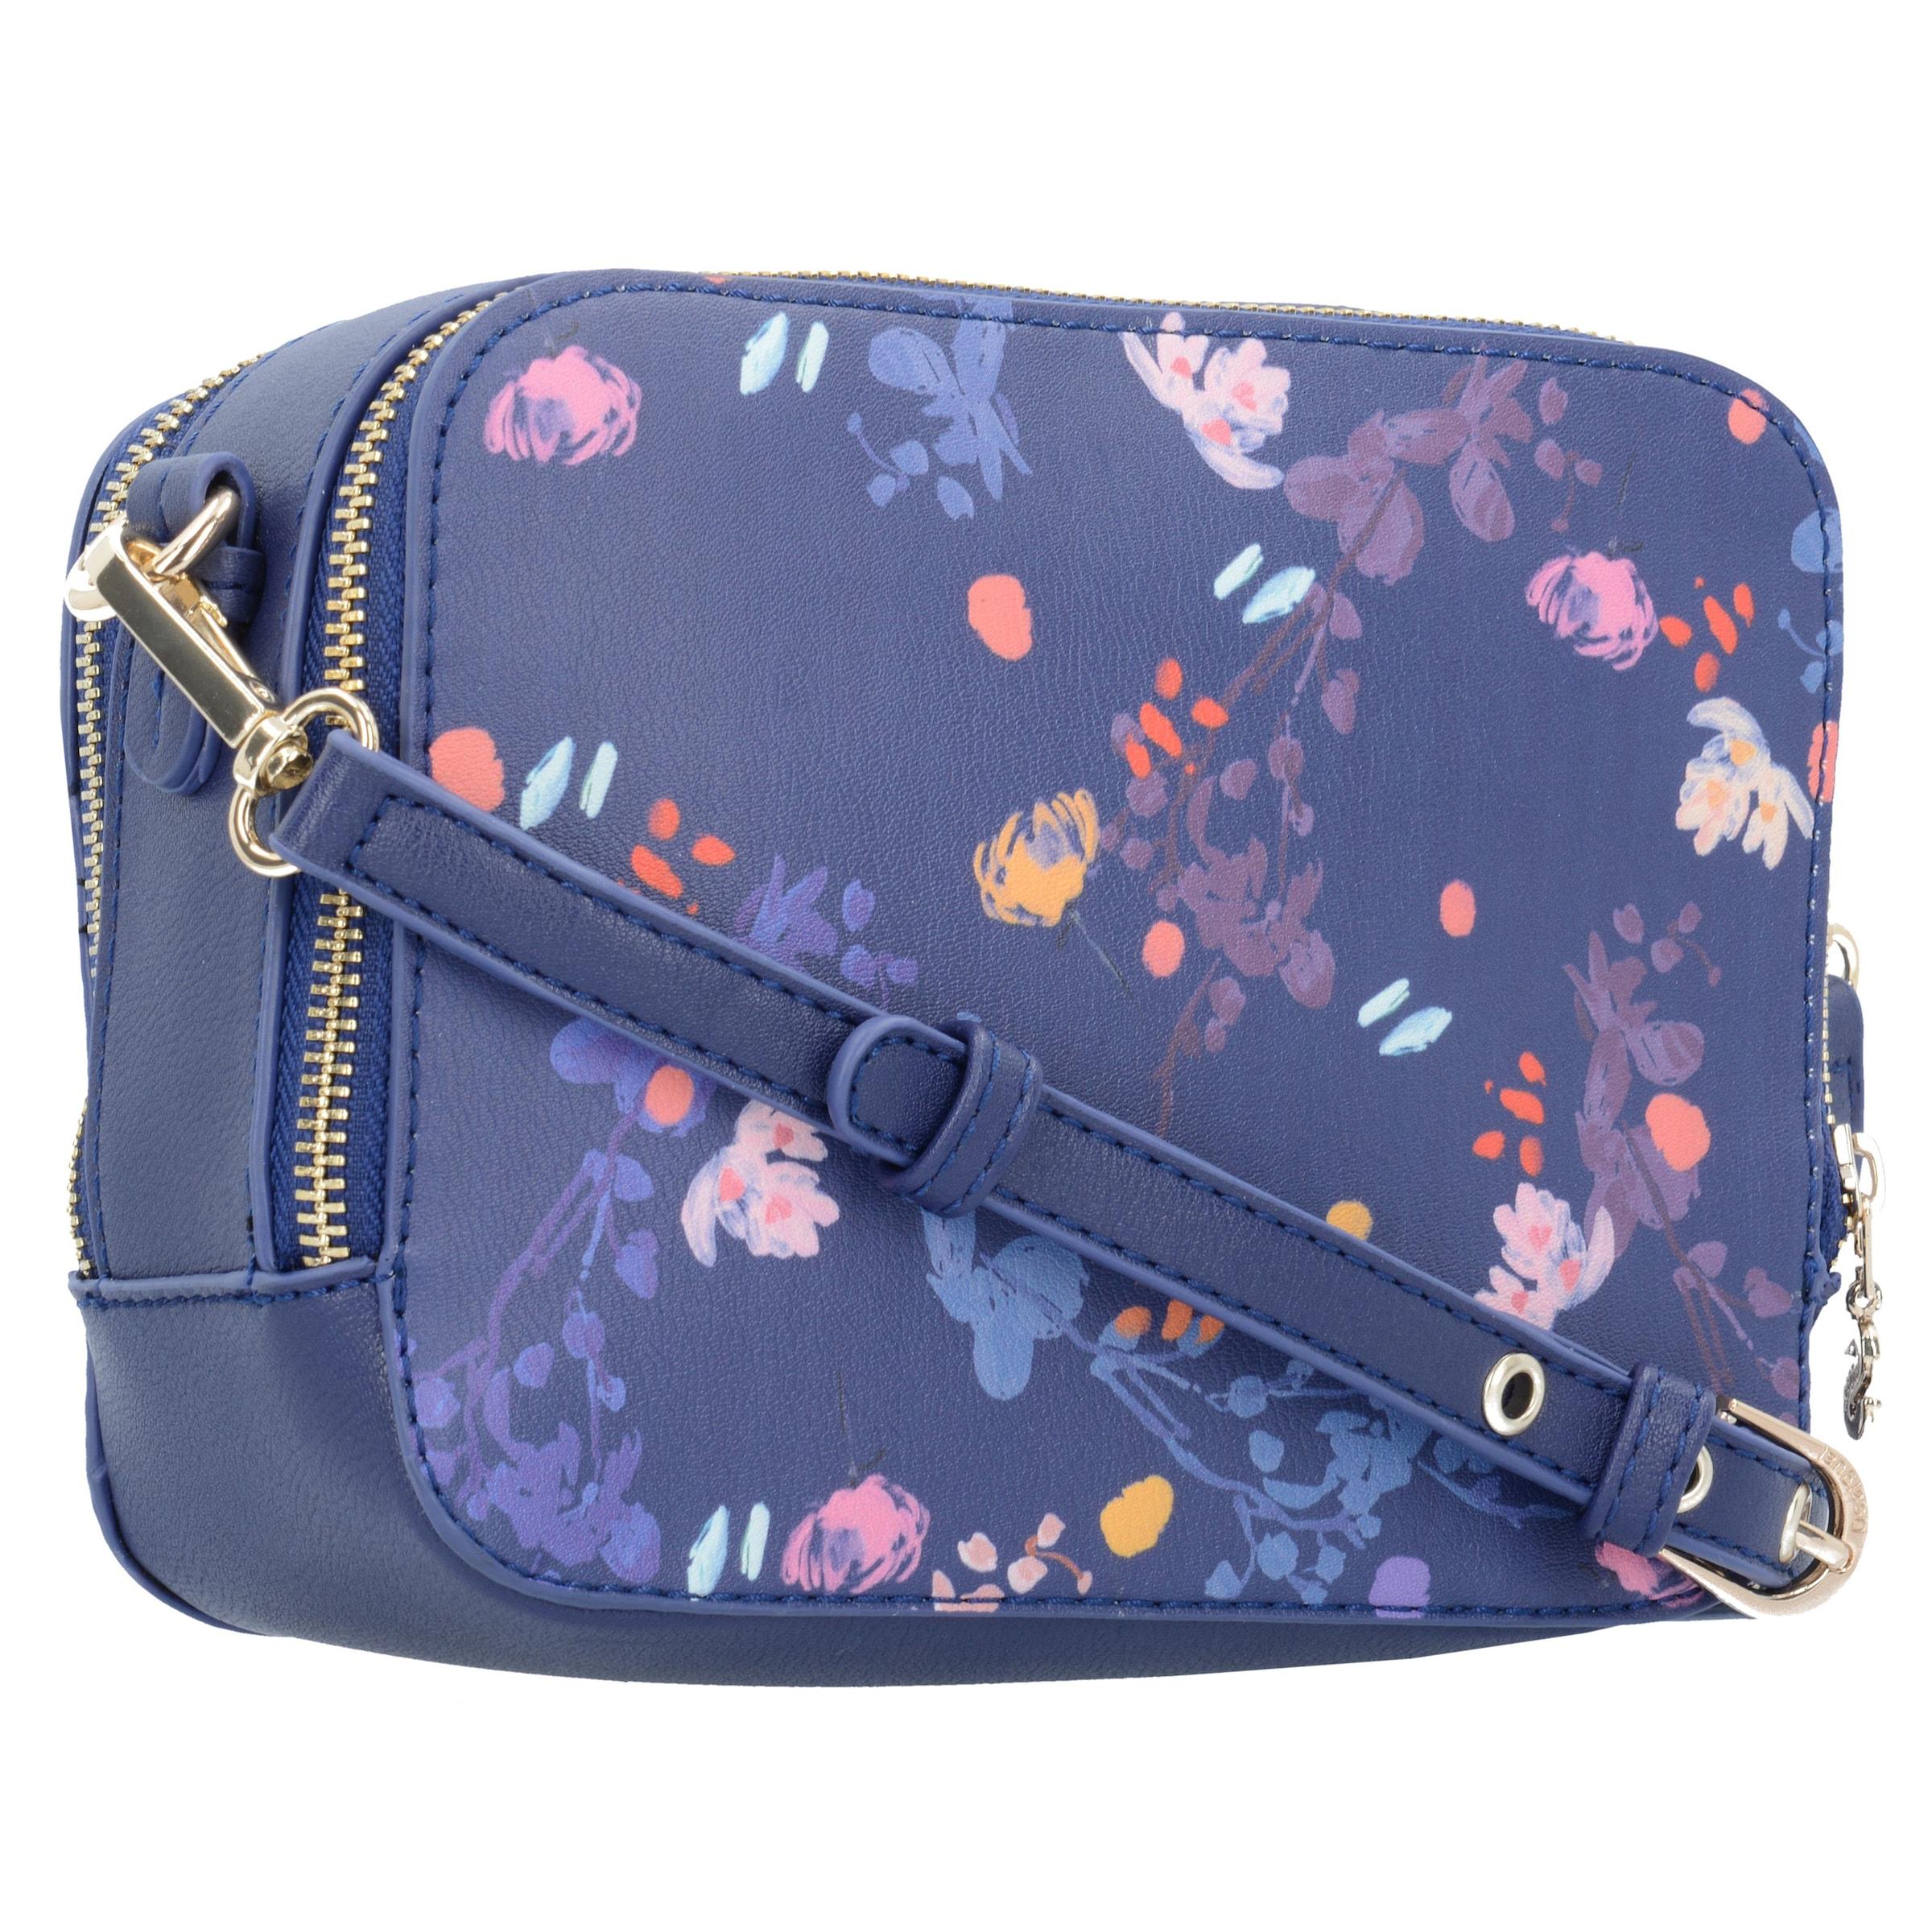 Desigual Bols Mini Bag Schultertasche 20 cm Günstiger Preis Cid3WVCoH